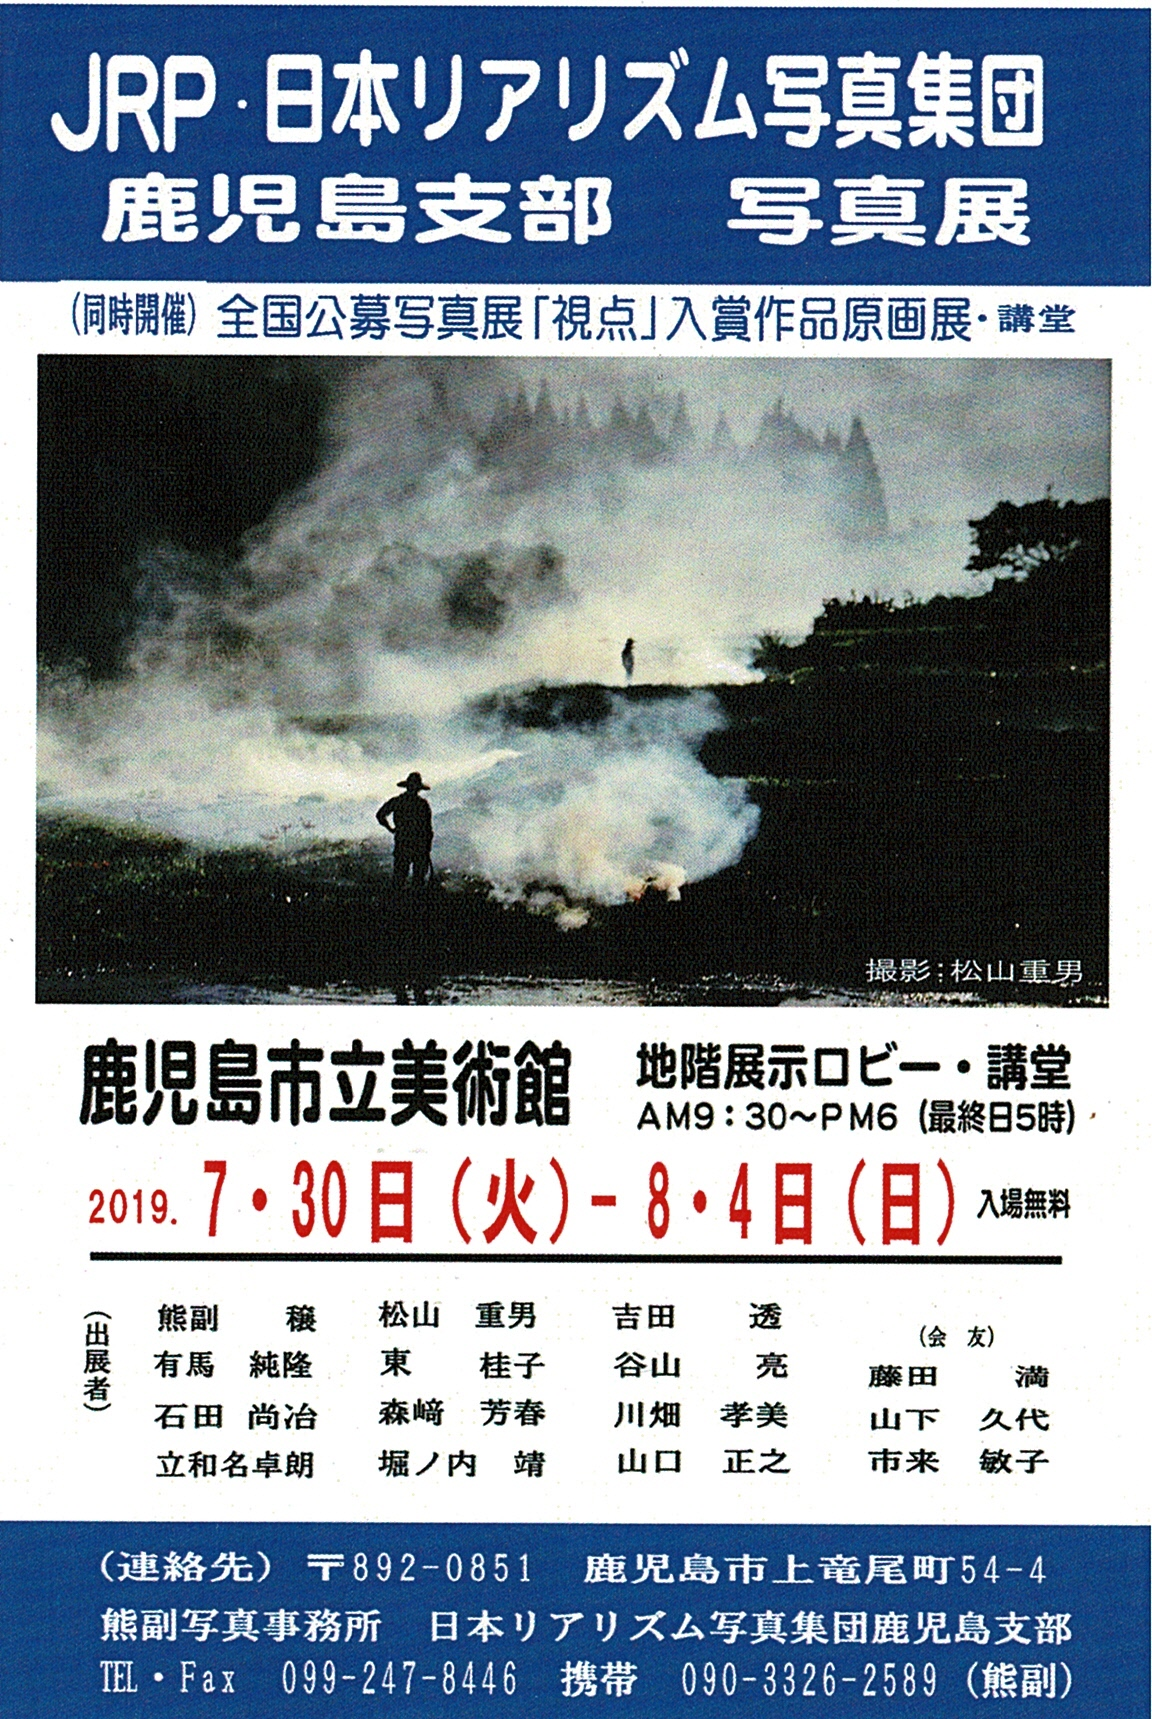 JRP・日本リアリズム写真集団 鹿児島支部写真展